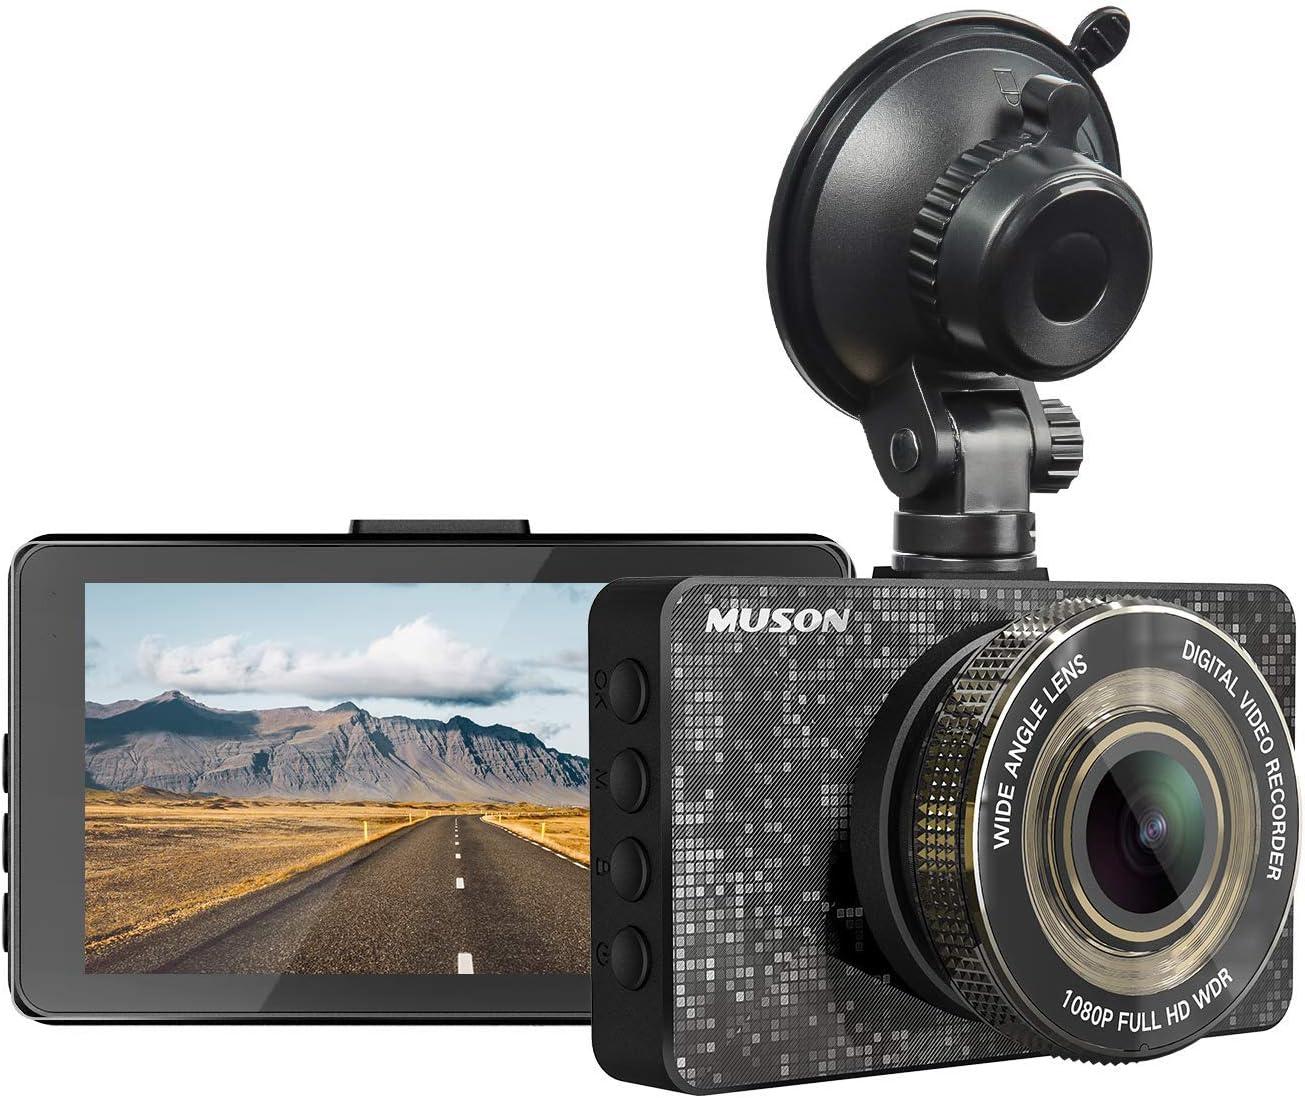 Dash Cam MUSON Car Dash Cam 1080P Full HD 3.2-inch Dashboard Camera, Super Night Version with 170° Wide Angle, Loop Recording, G-Sensor Protection Dash Camera for Car, WDR, Parking Guard Car Camera